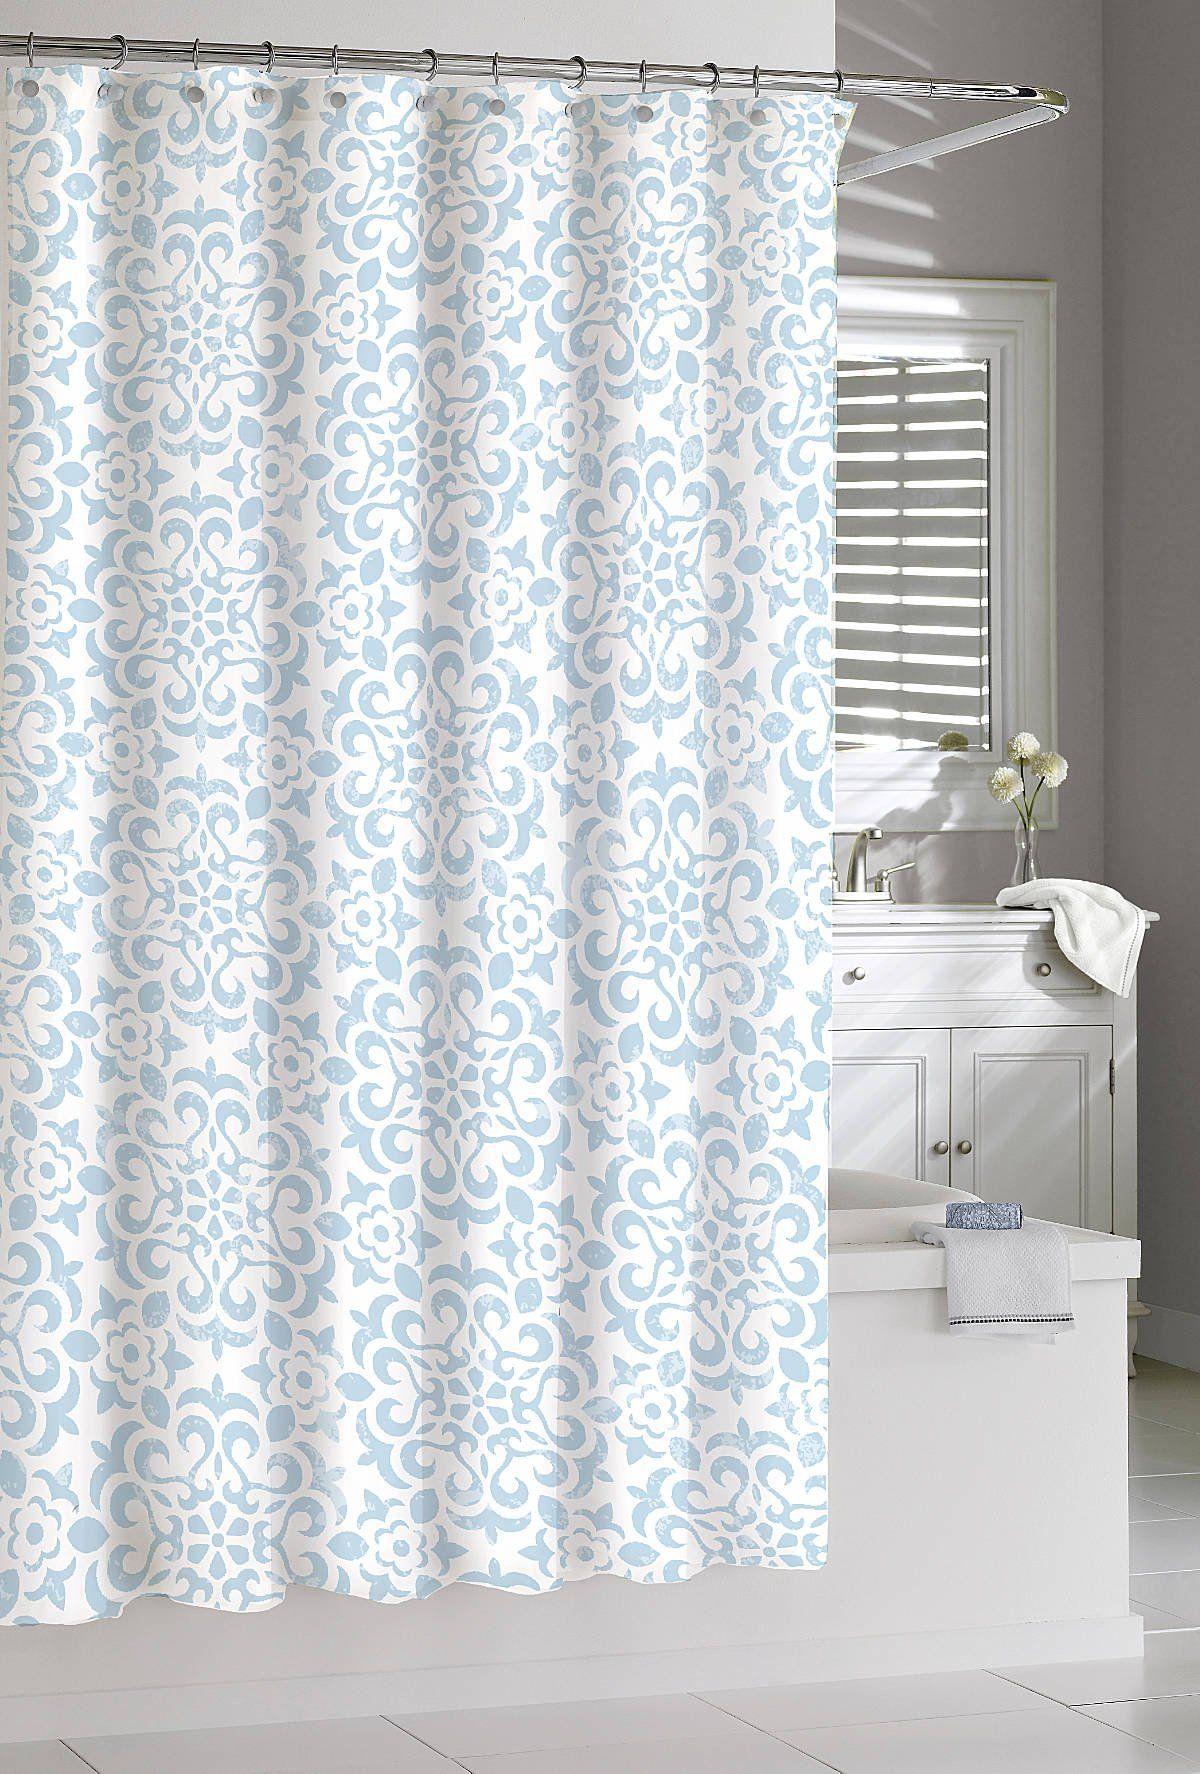 Shower Curtain Kassatex Seawave Medallion Spa Blue 72 X 72 Cotton